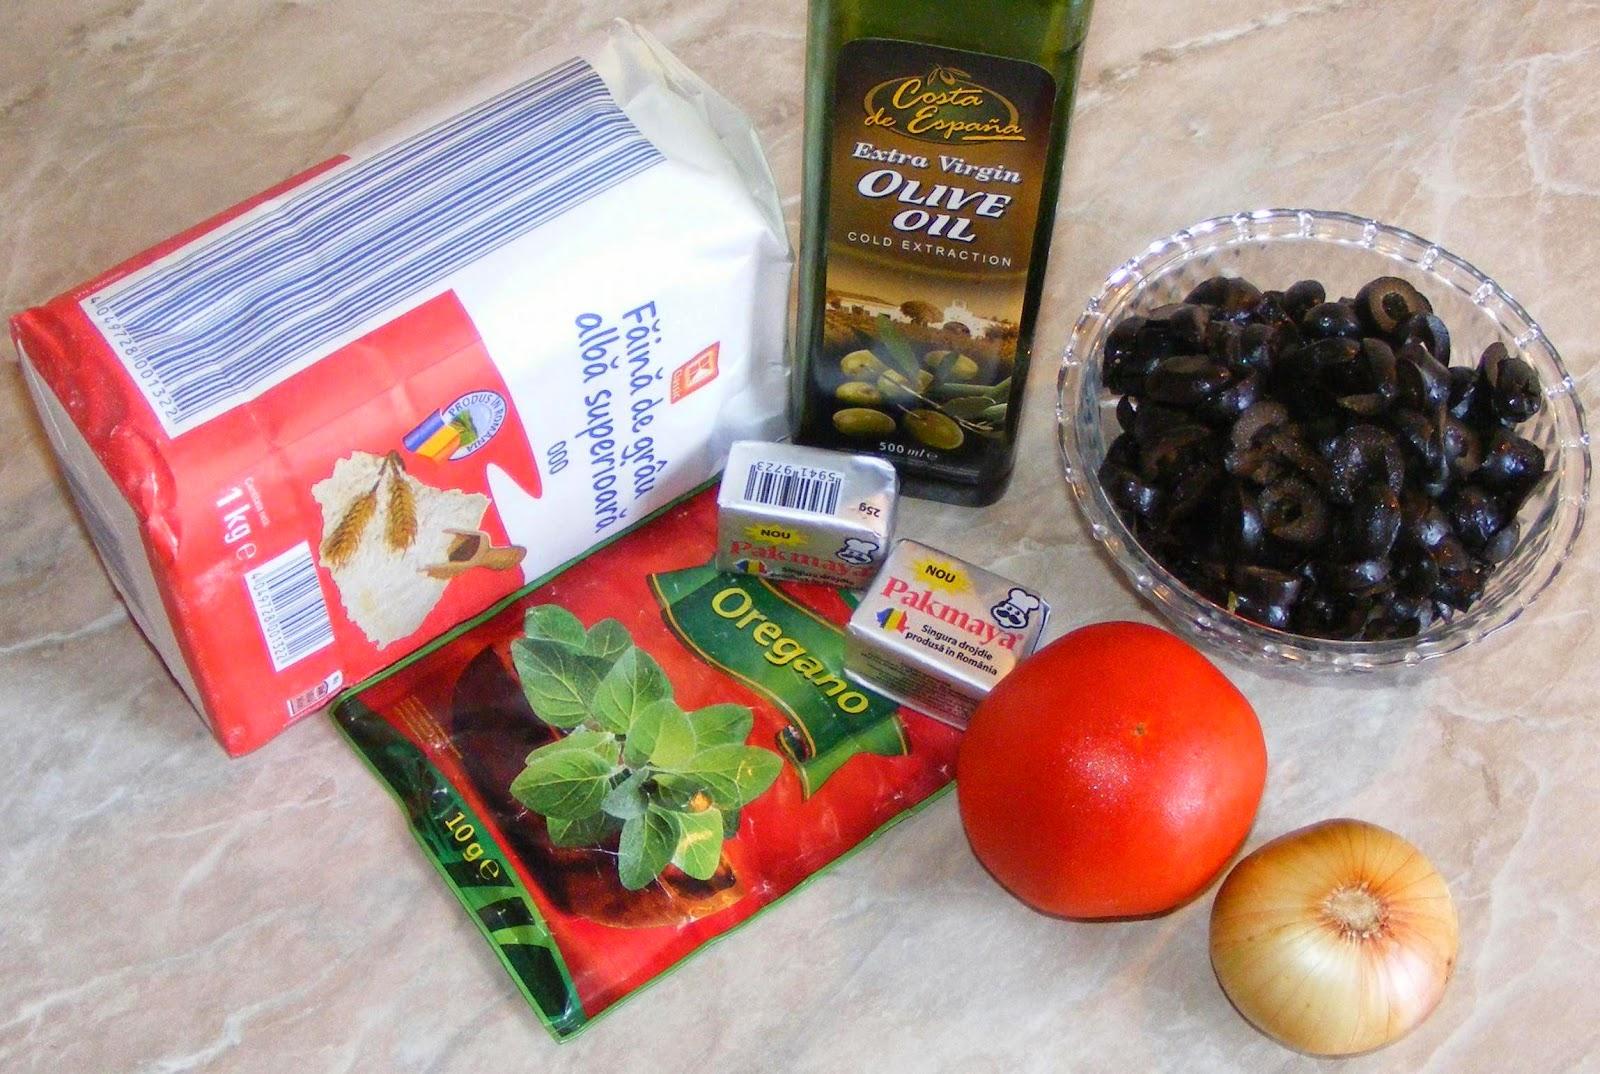 ingrediente focaccia cu rosii si masline, ce ne trebuie pentru a prepara focaccia, de ce avem nevoie pentru a prepara focaccia italiana buna, ingrediente focaccia italiana,